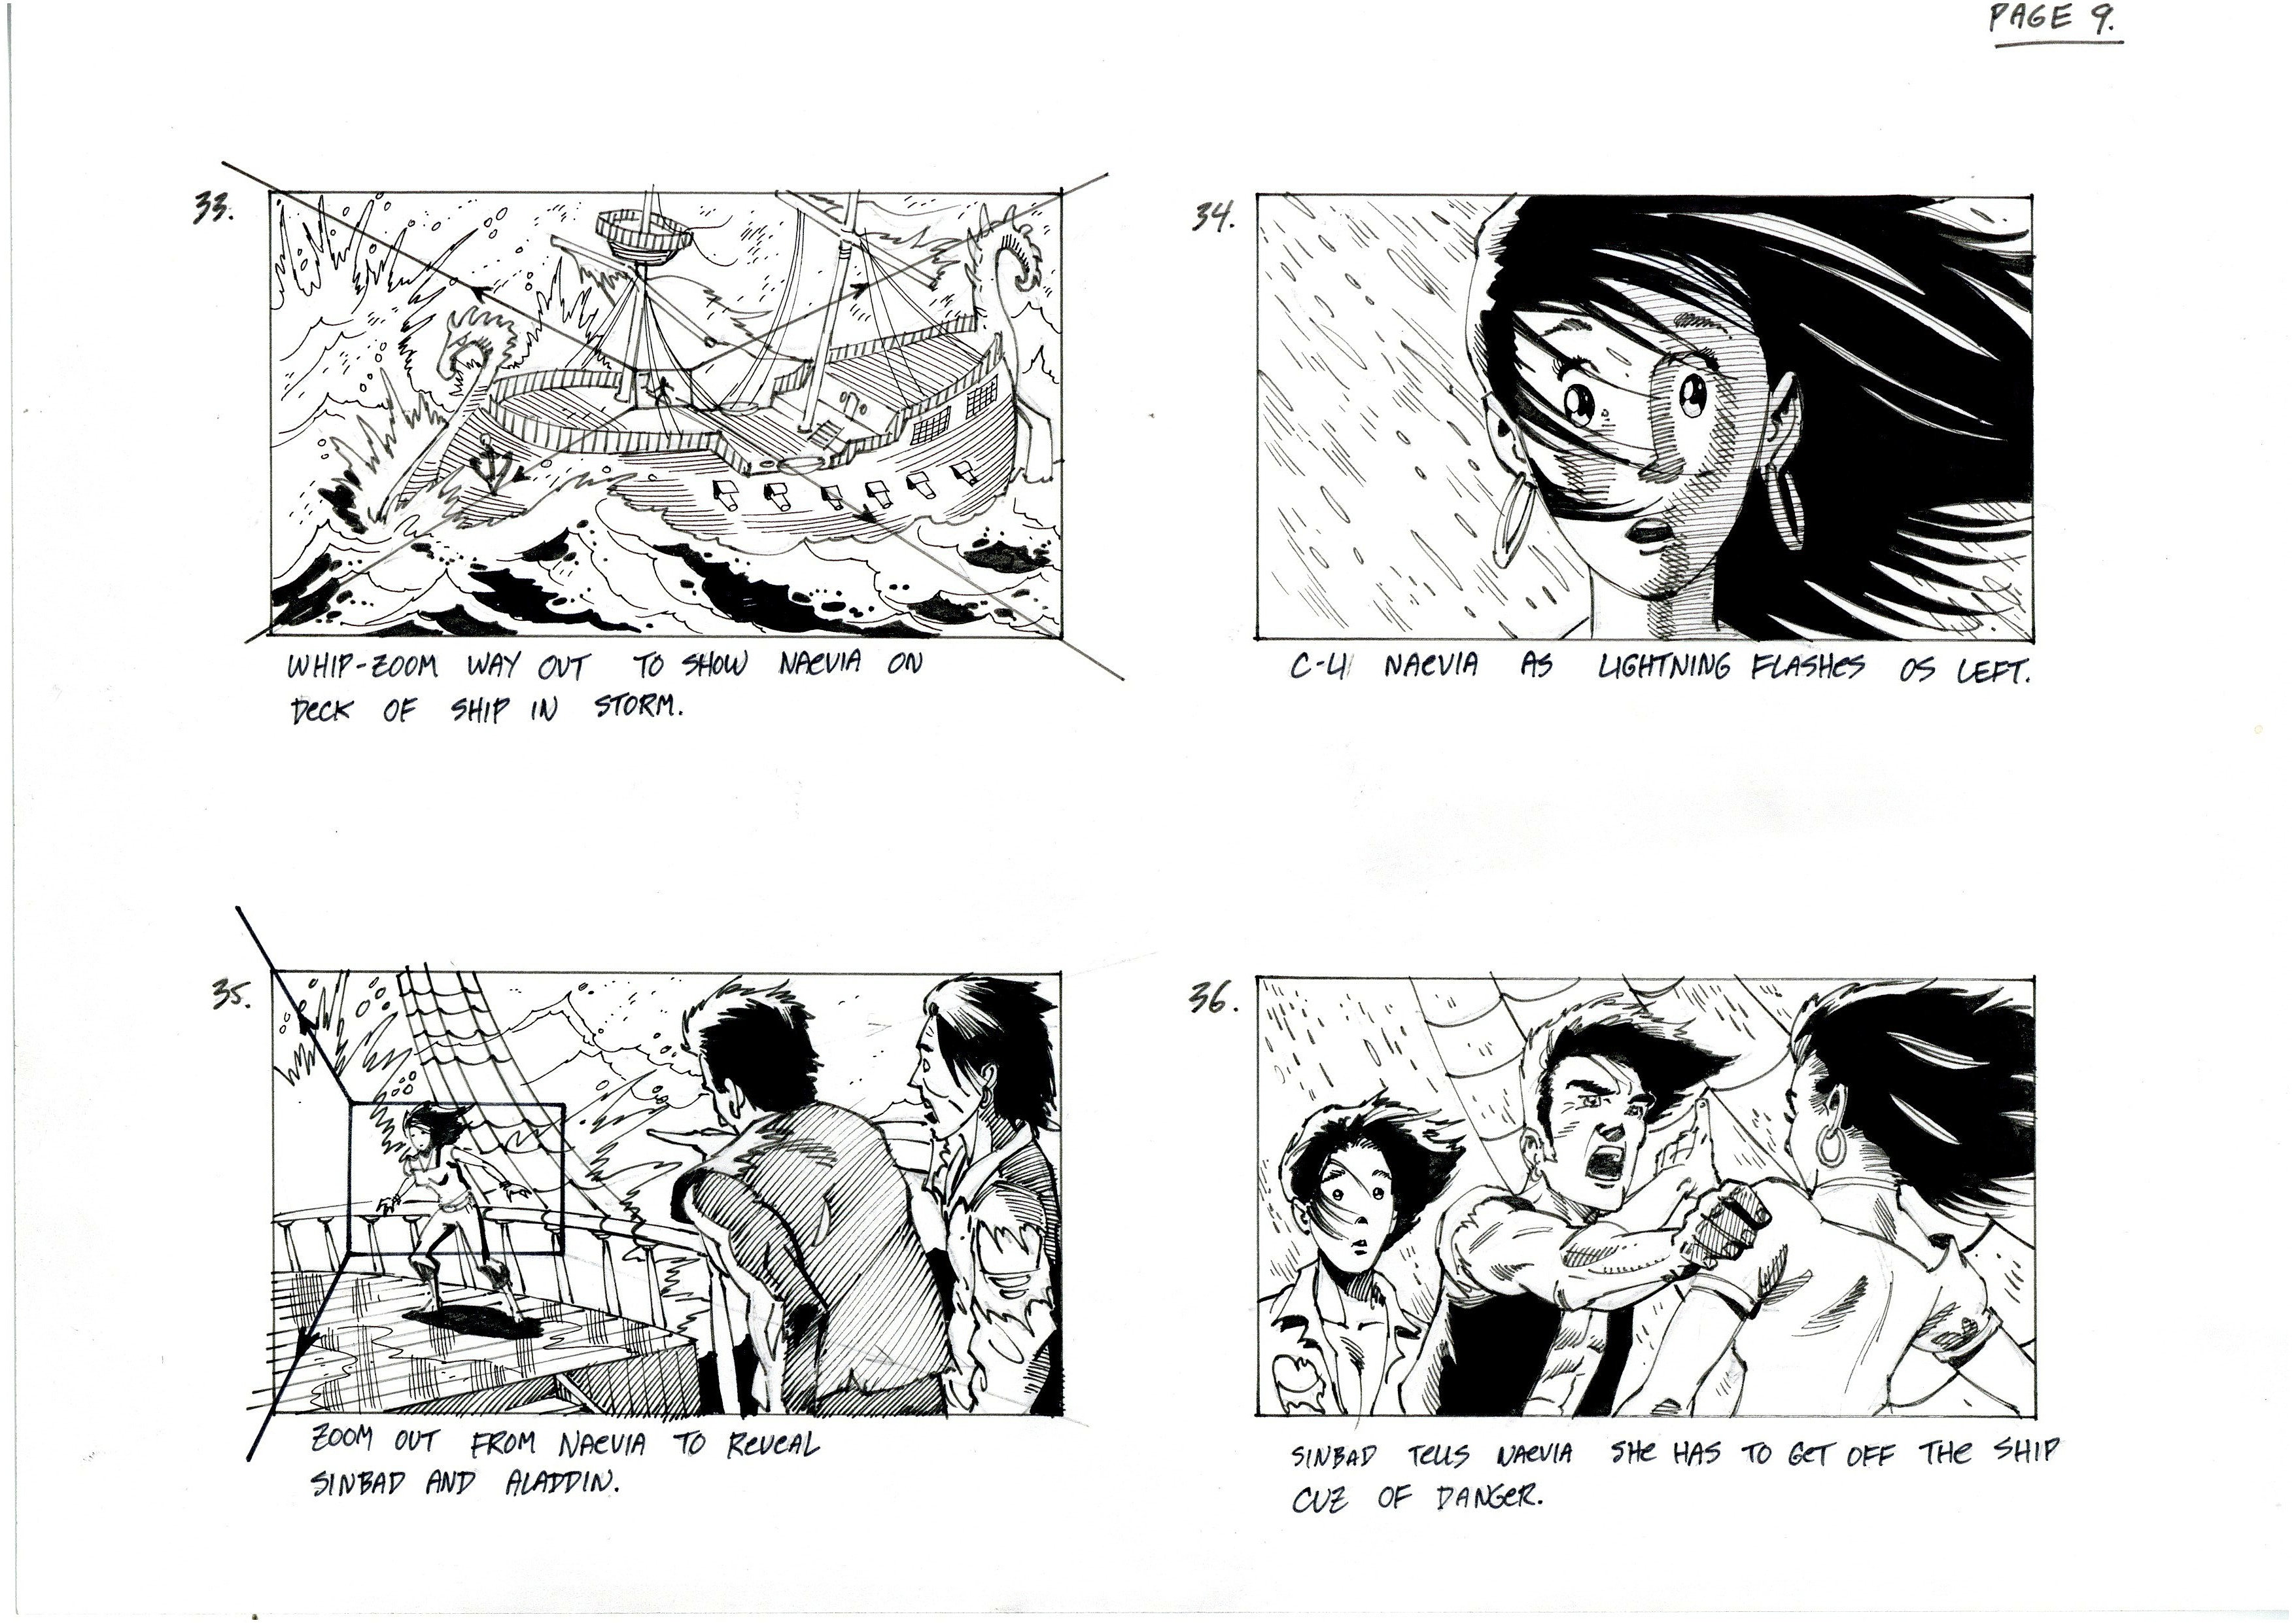 Prentis RollinsillustrationNew York and London – Storyboard Sample